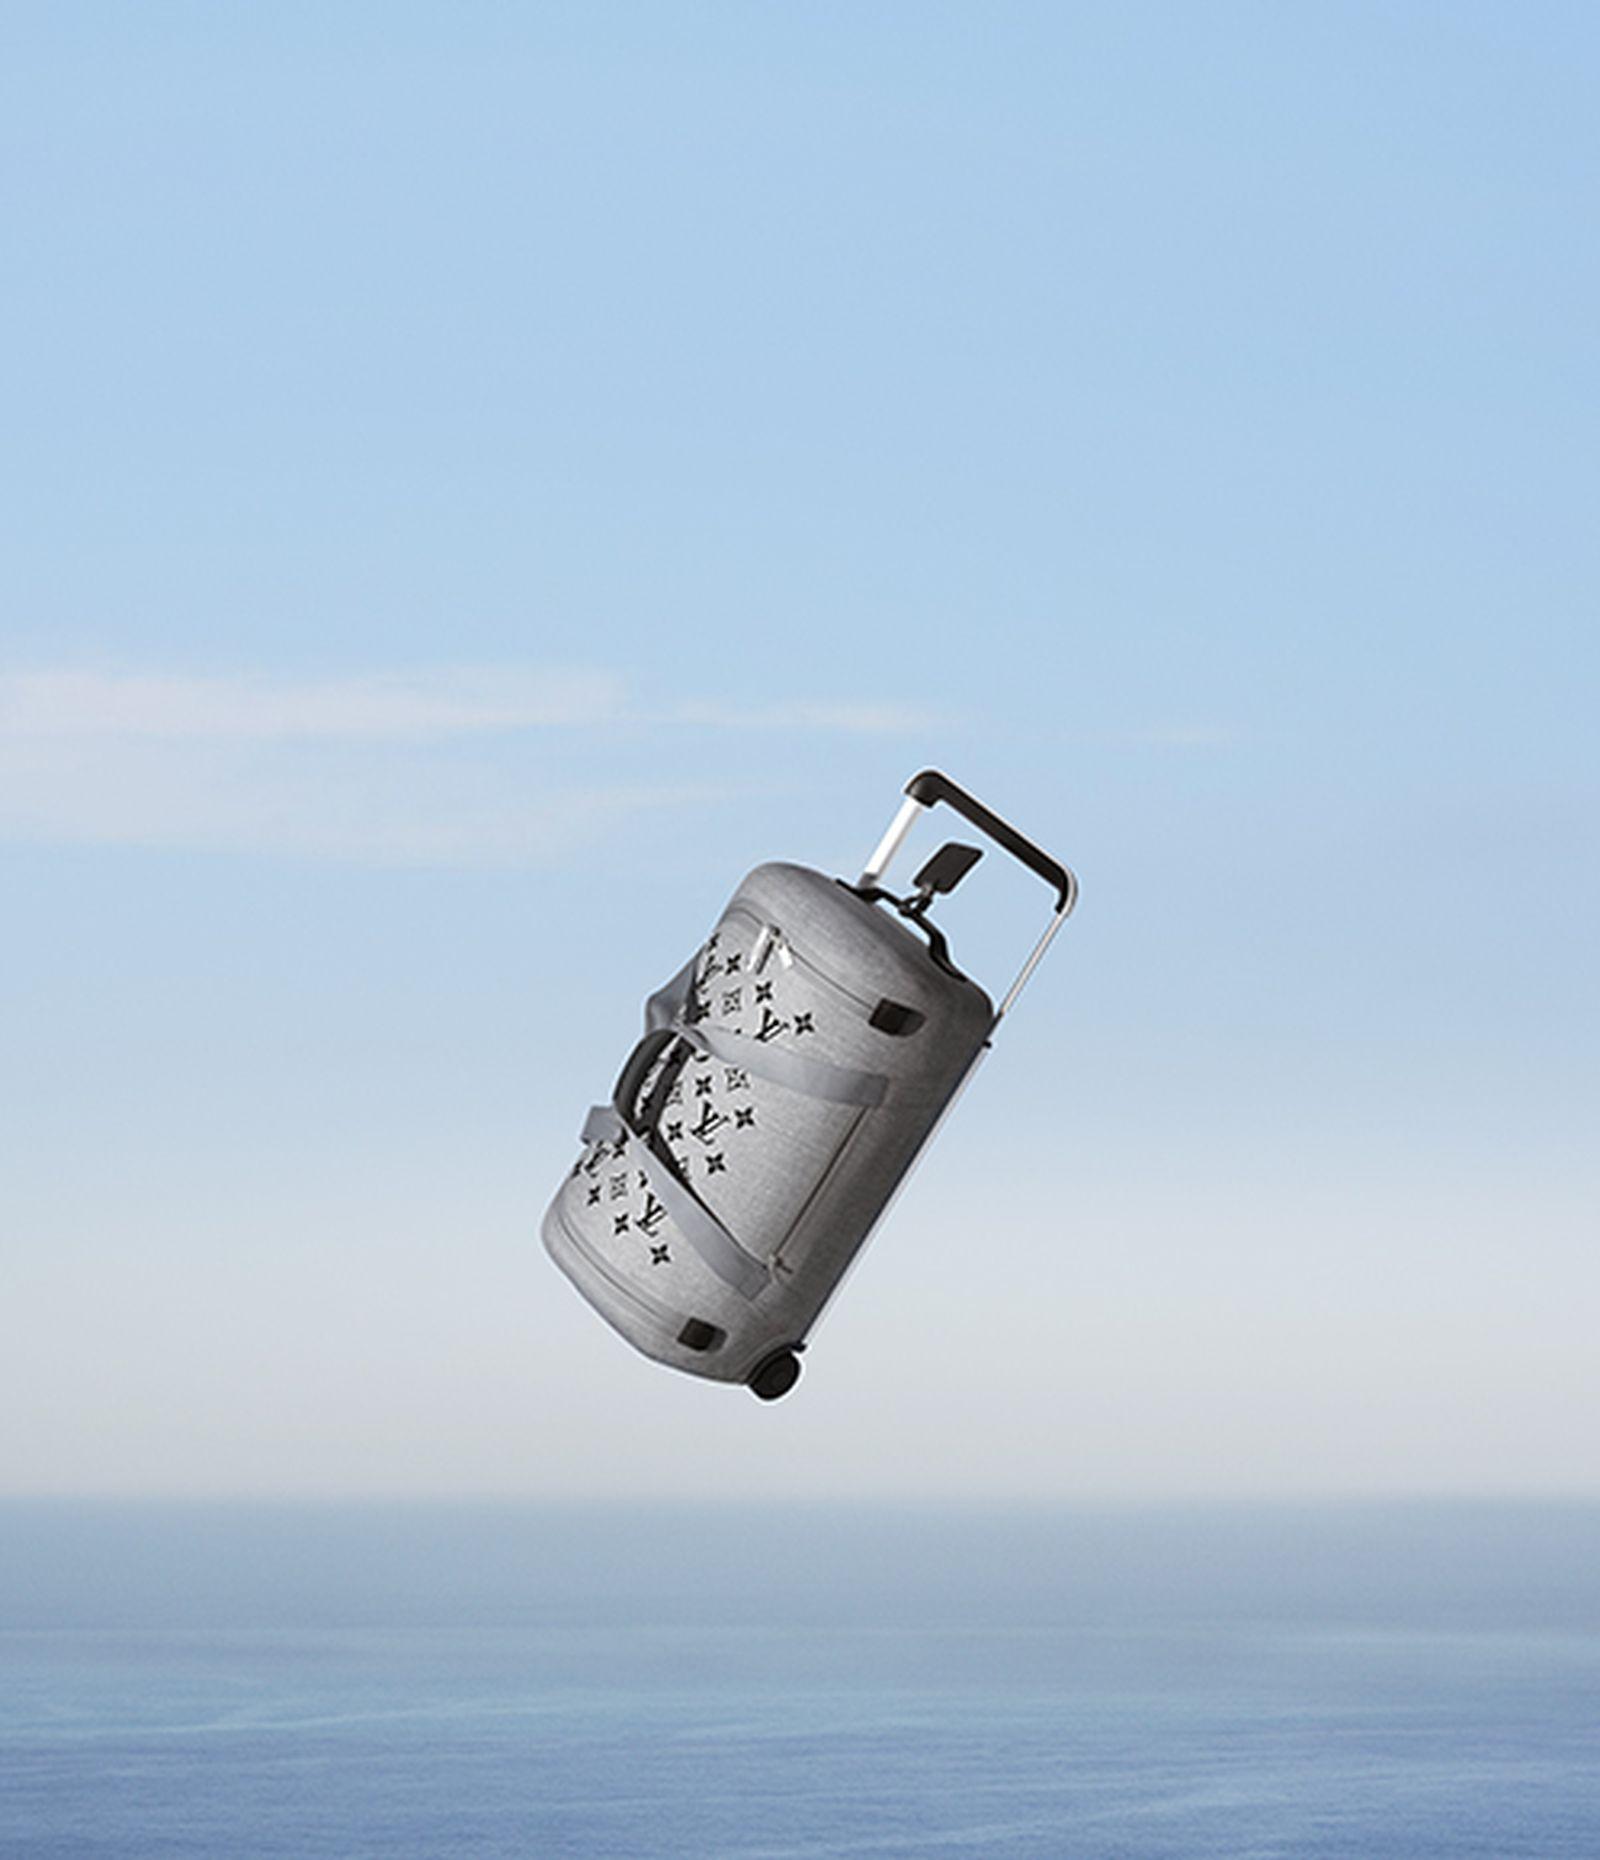 louis vuitton horizon soft luggage 1 marc newson